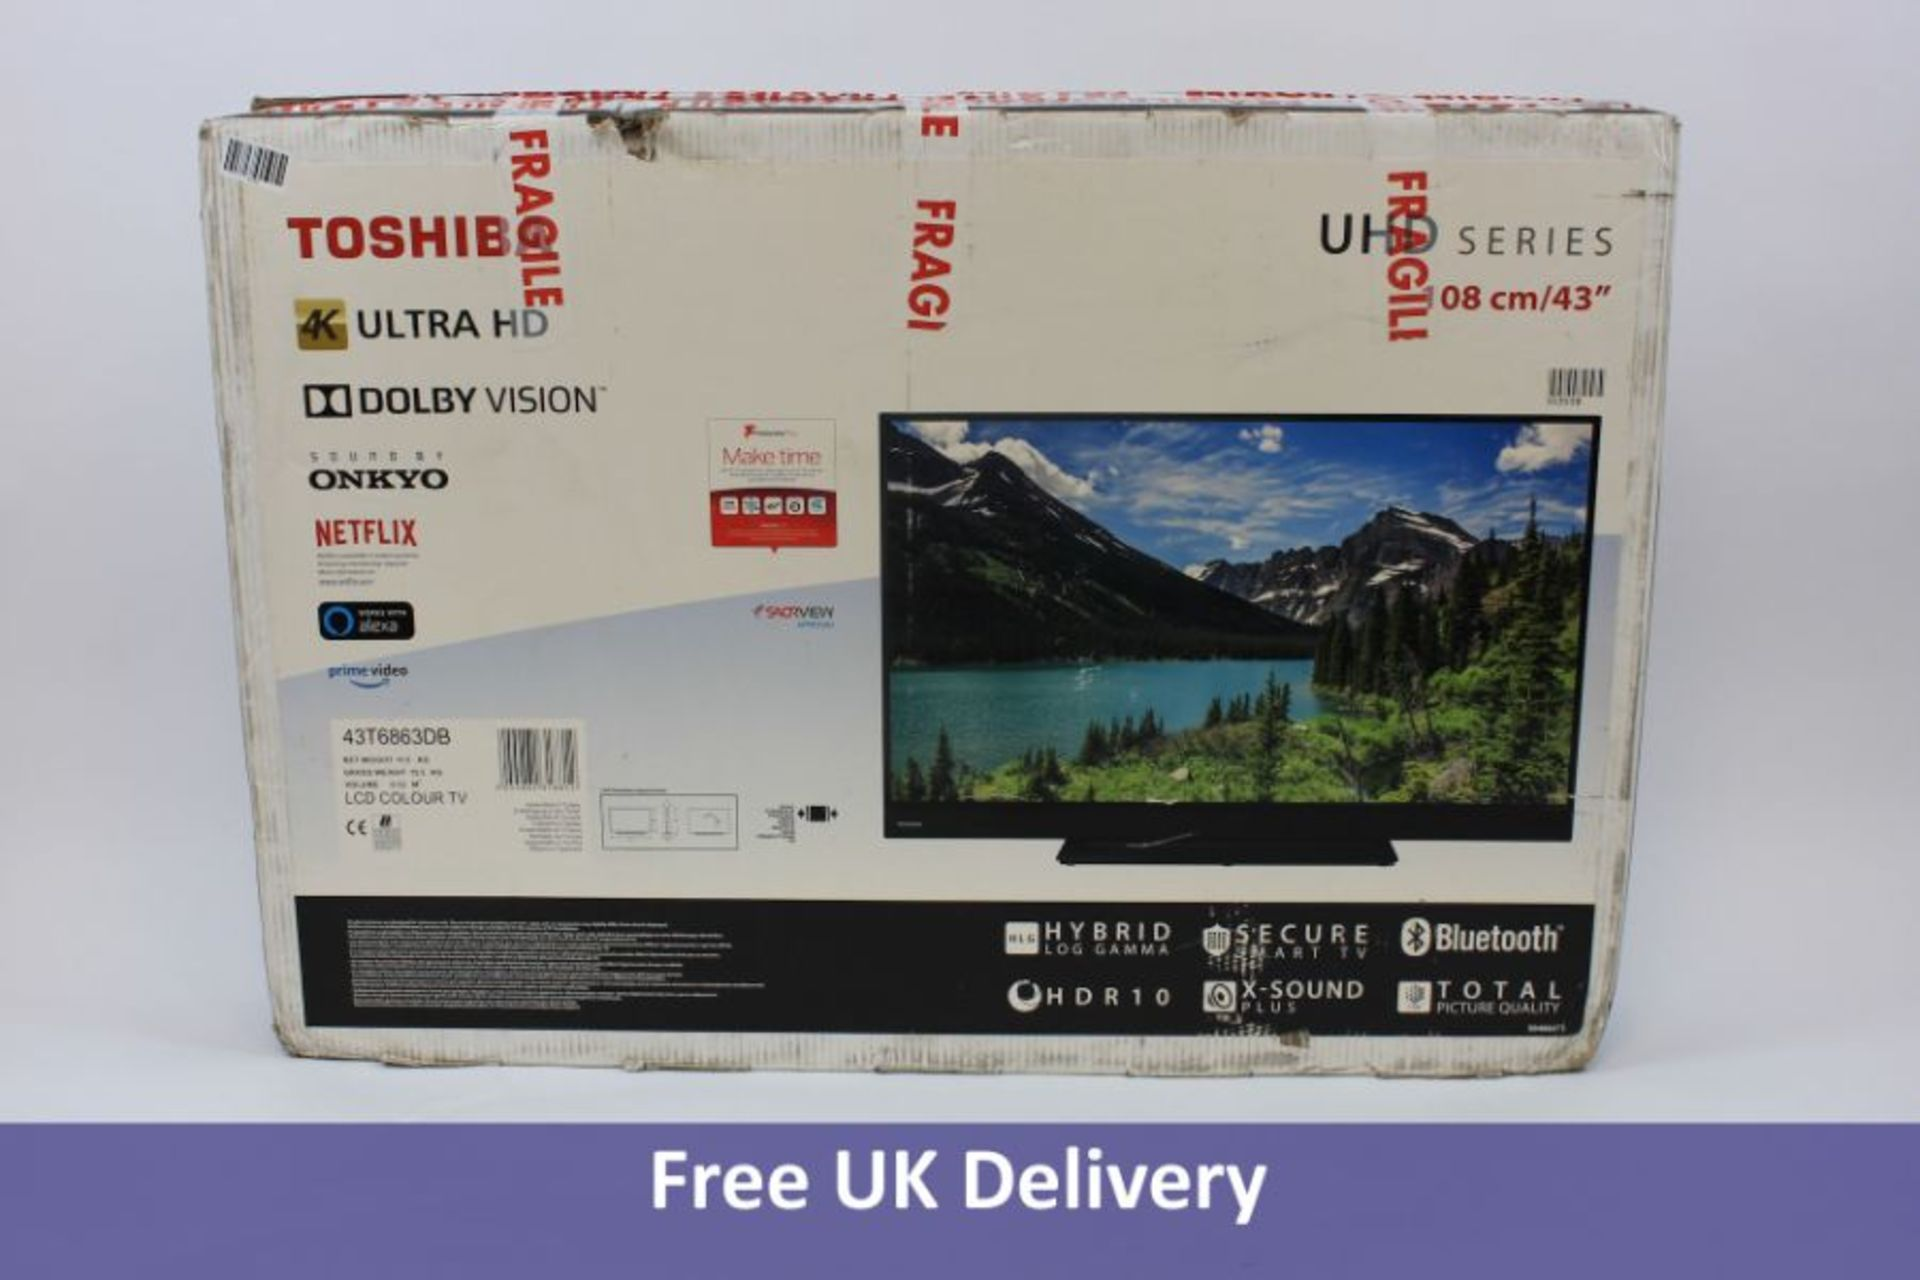 Toshiba UHD 4K Ultra HD Bluetooth TV With Stand, 43 Inch, Black